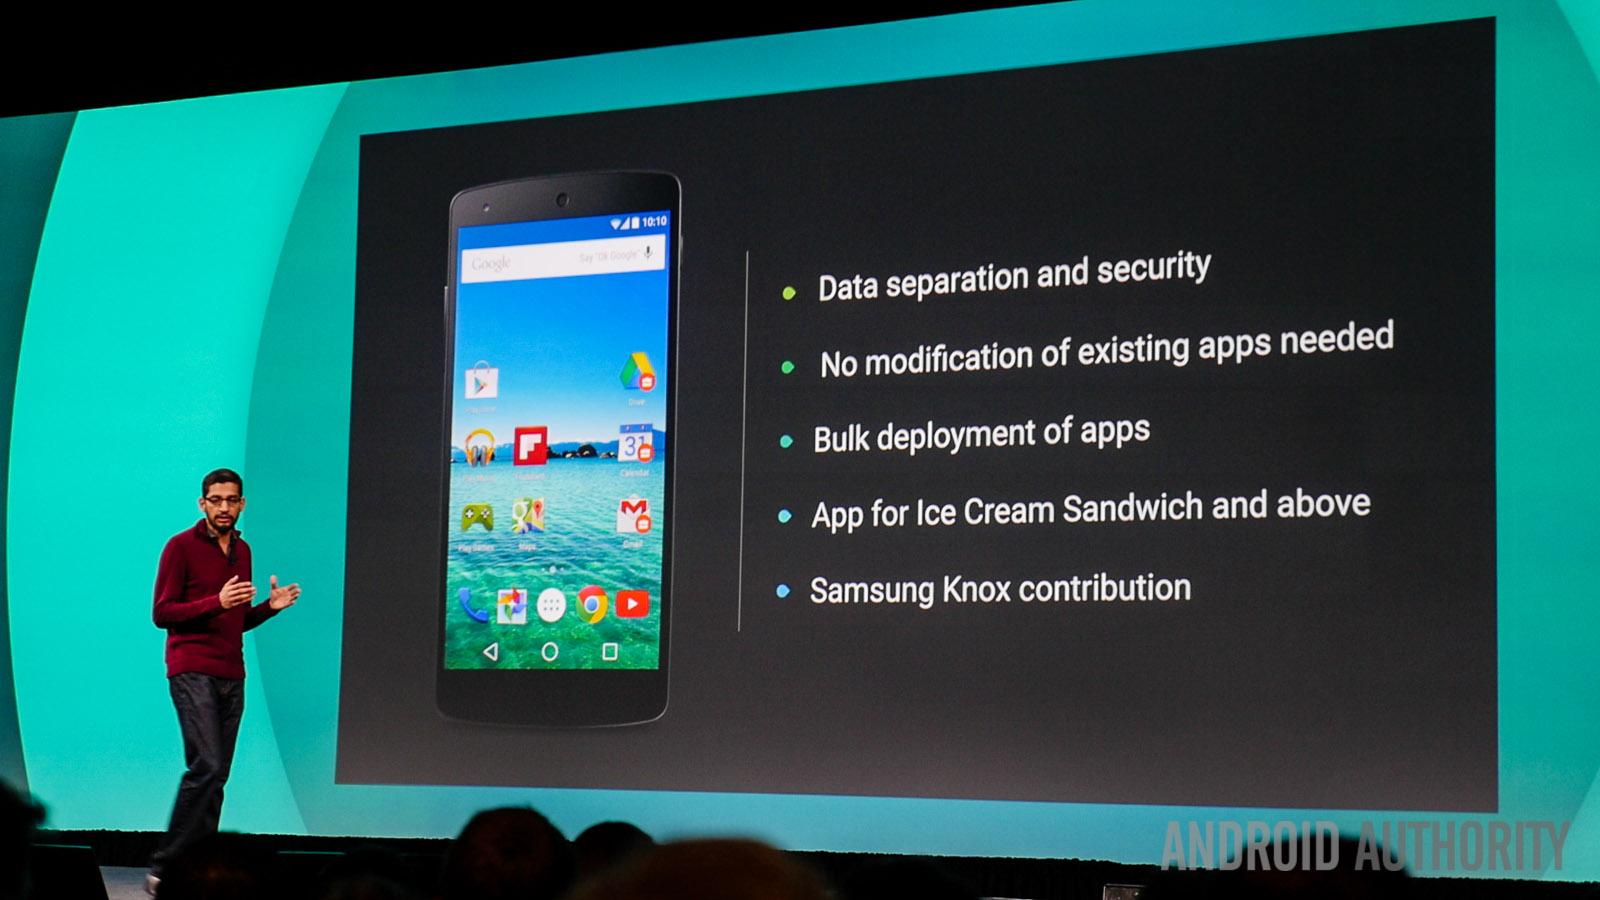 security google io 2014 keynote (37 of 41)